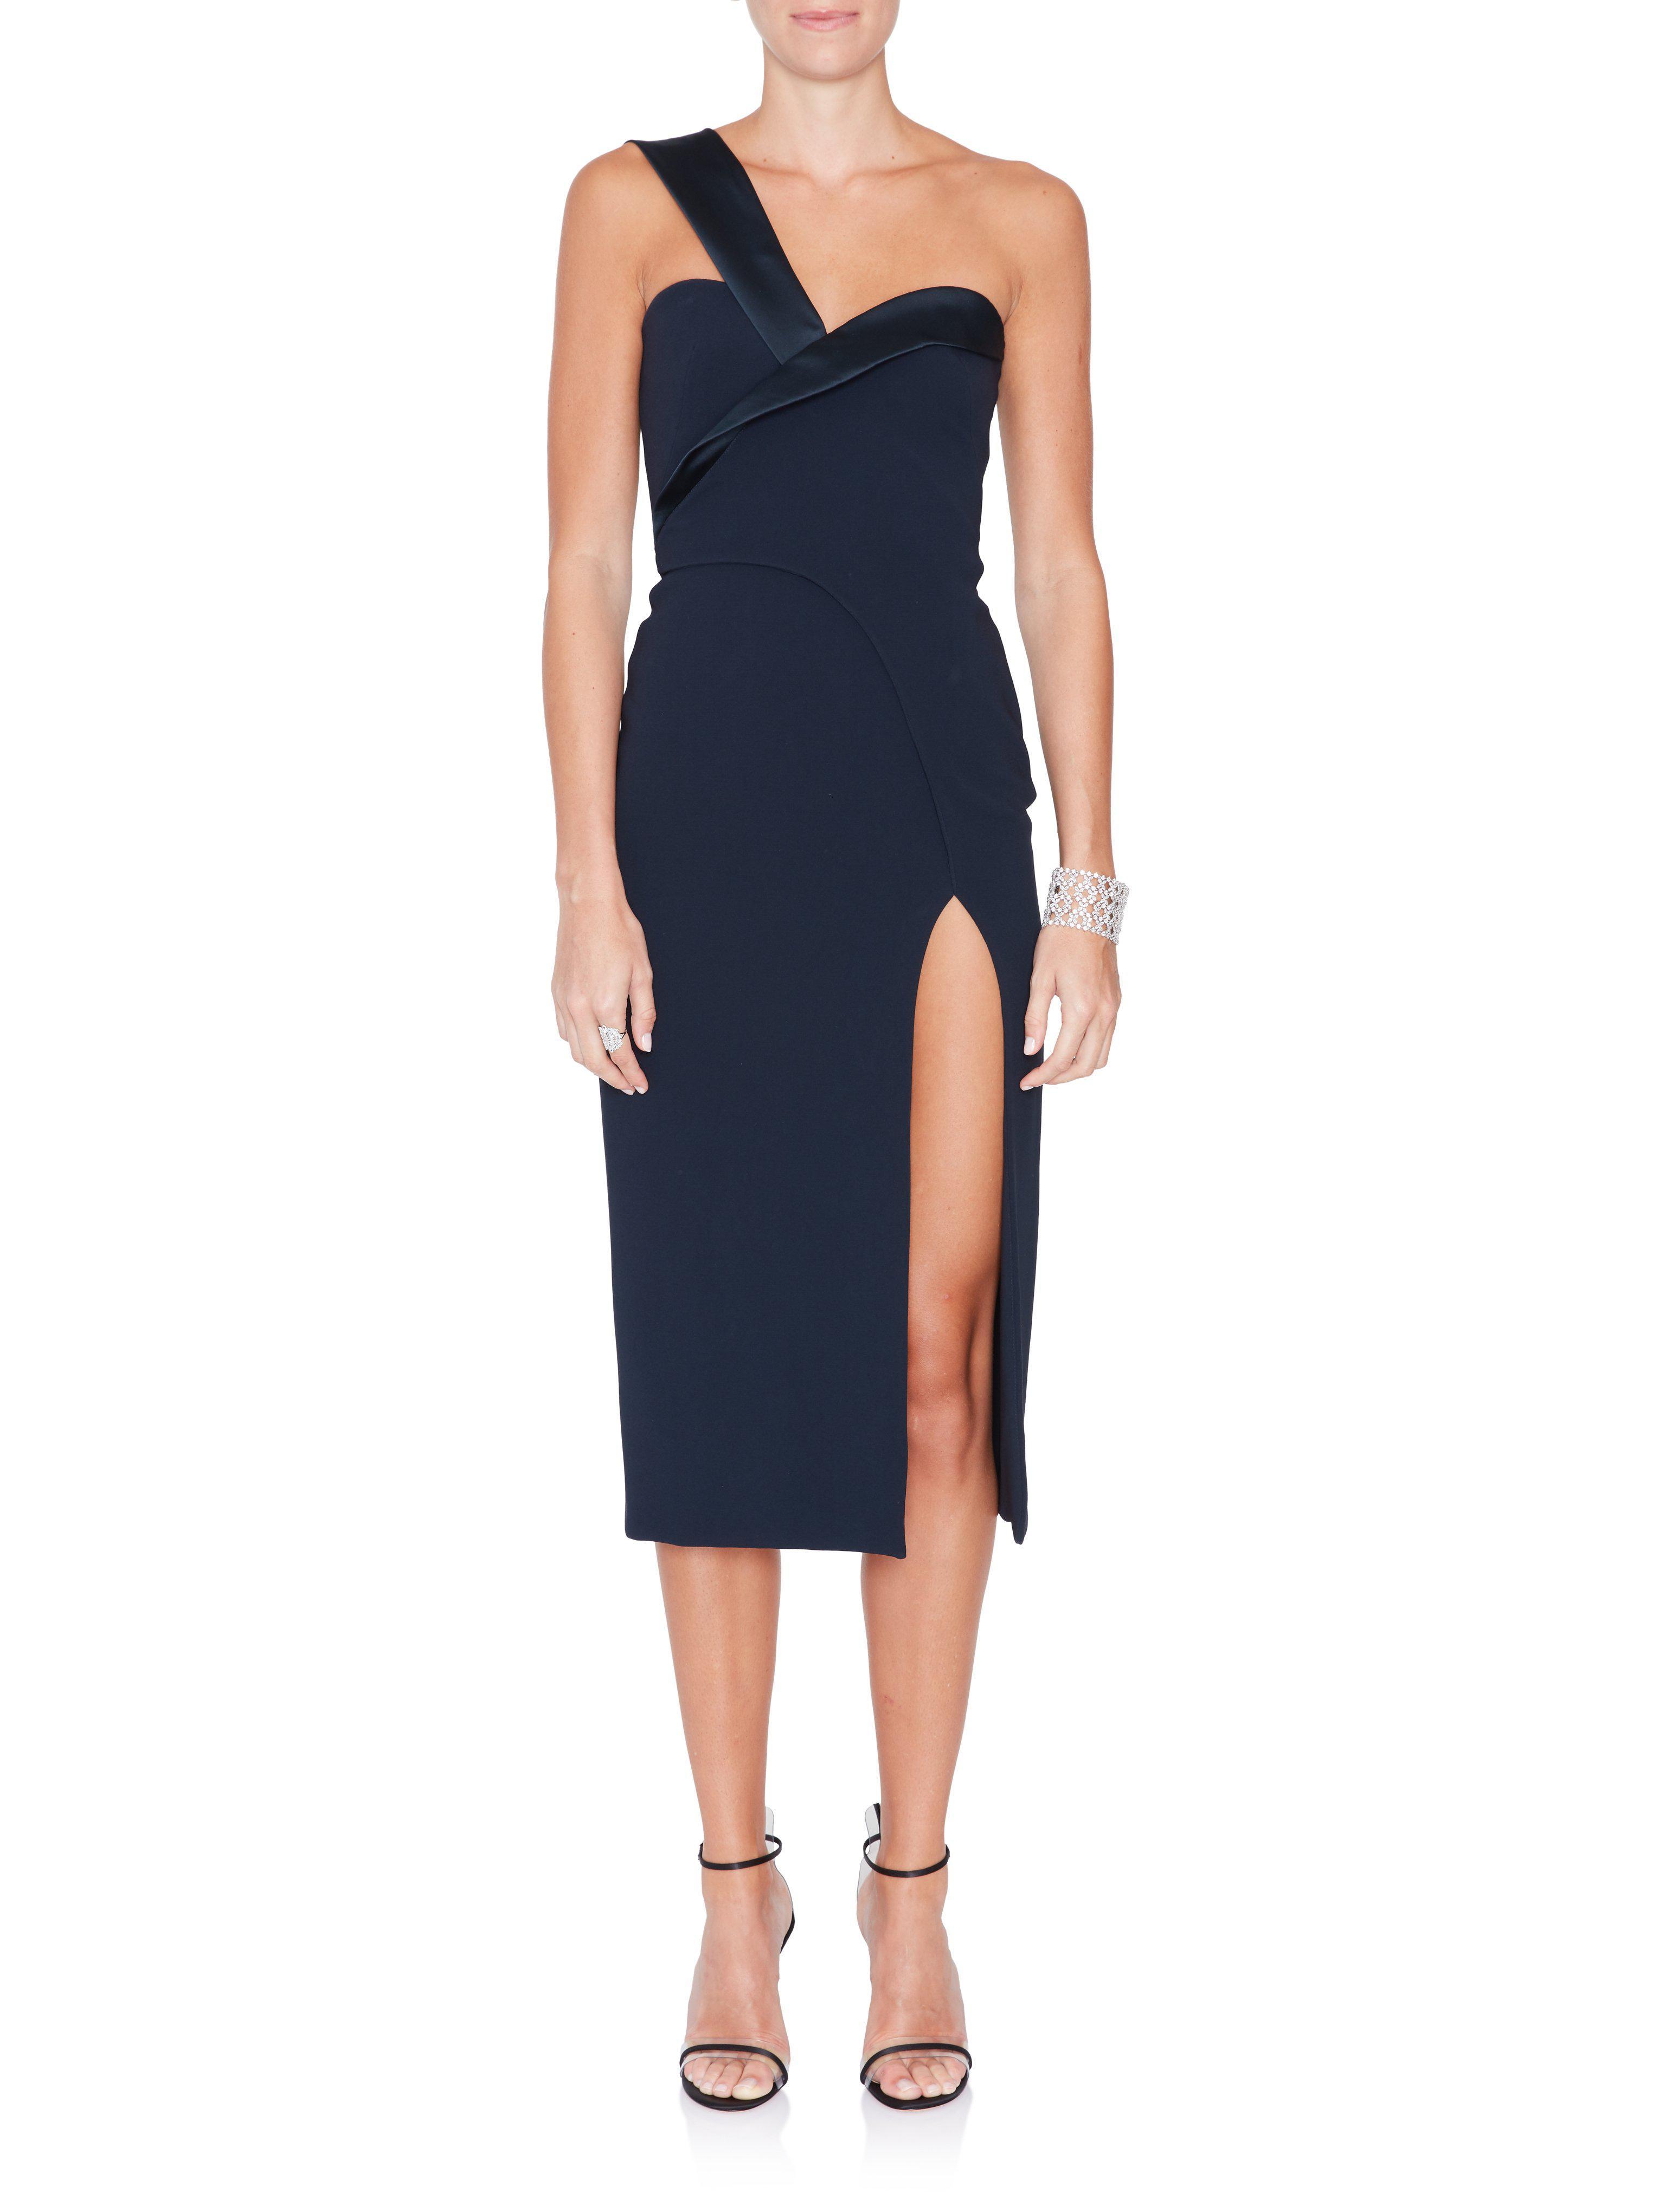 36b7f9d75f5 Lyst - Brandon Maxwell One-shoulder Crepe Satin Dress in Blue